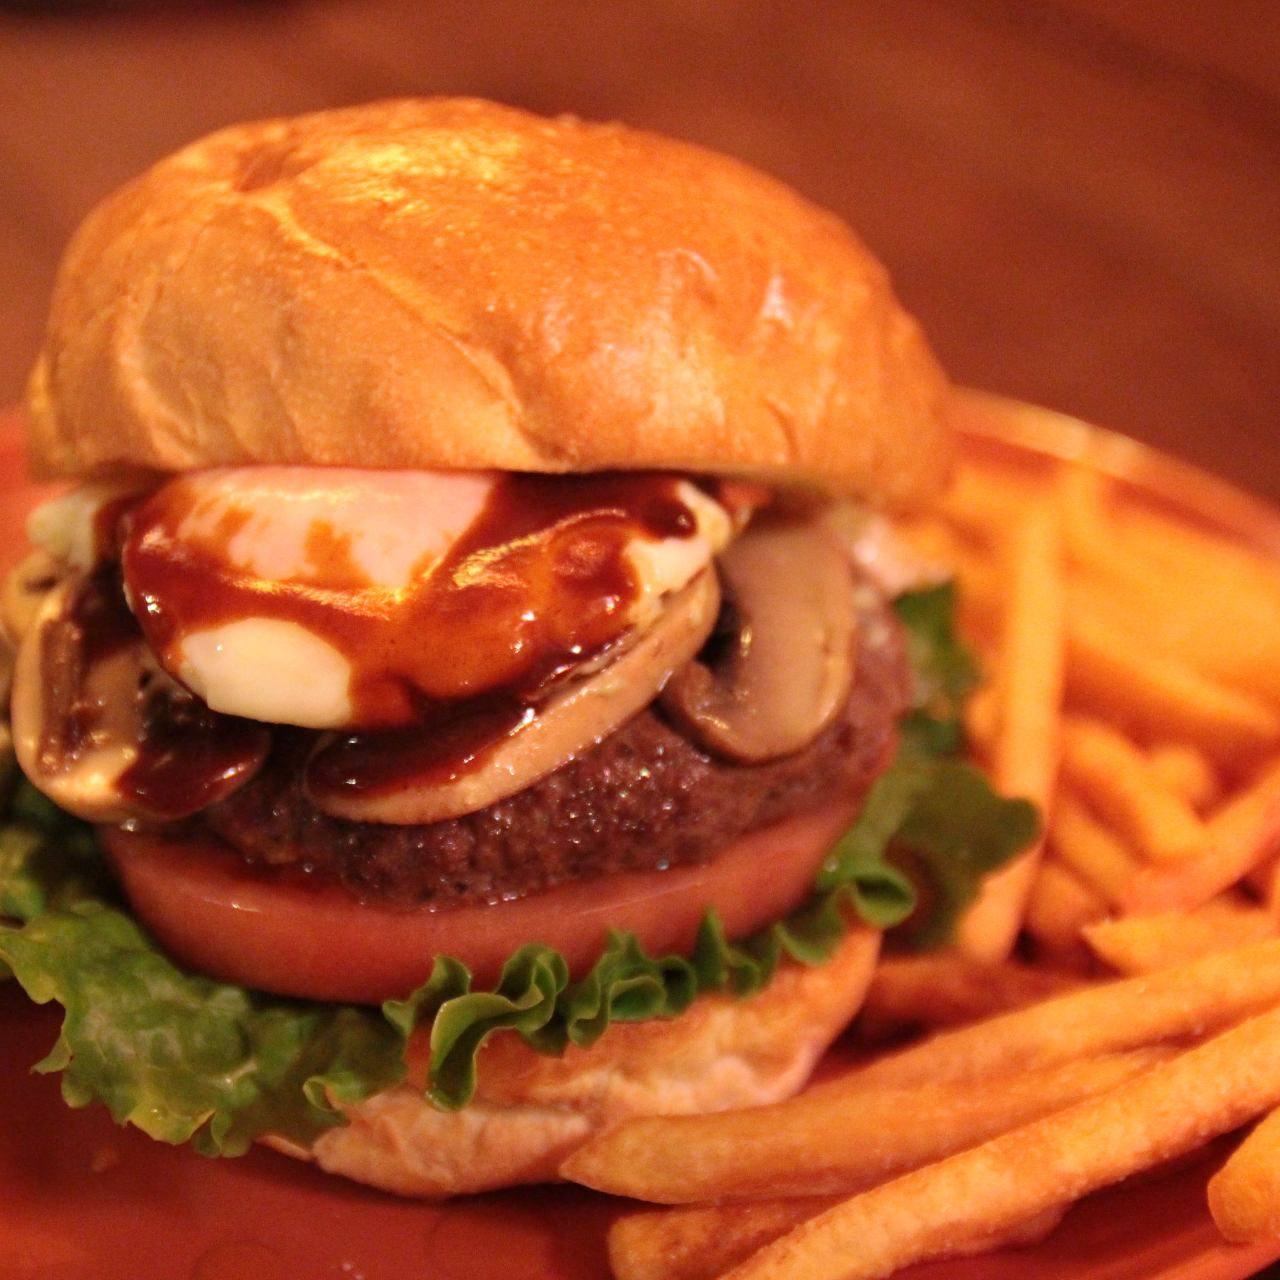 WOOD STOCKのハンバーガーをご自宅でも♪